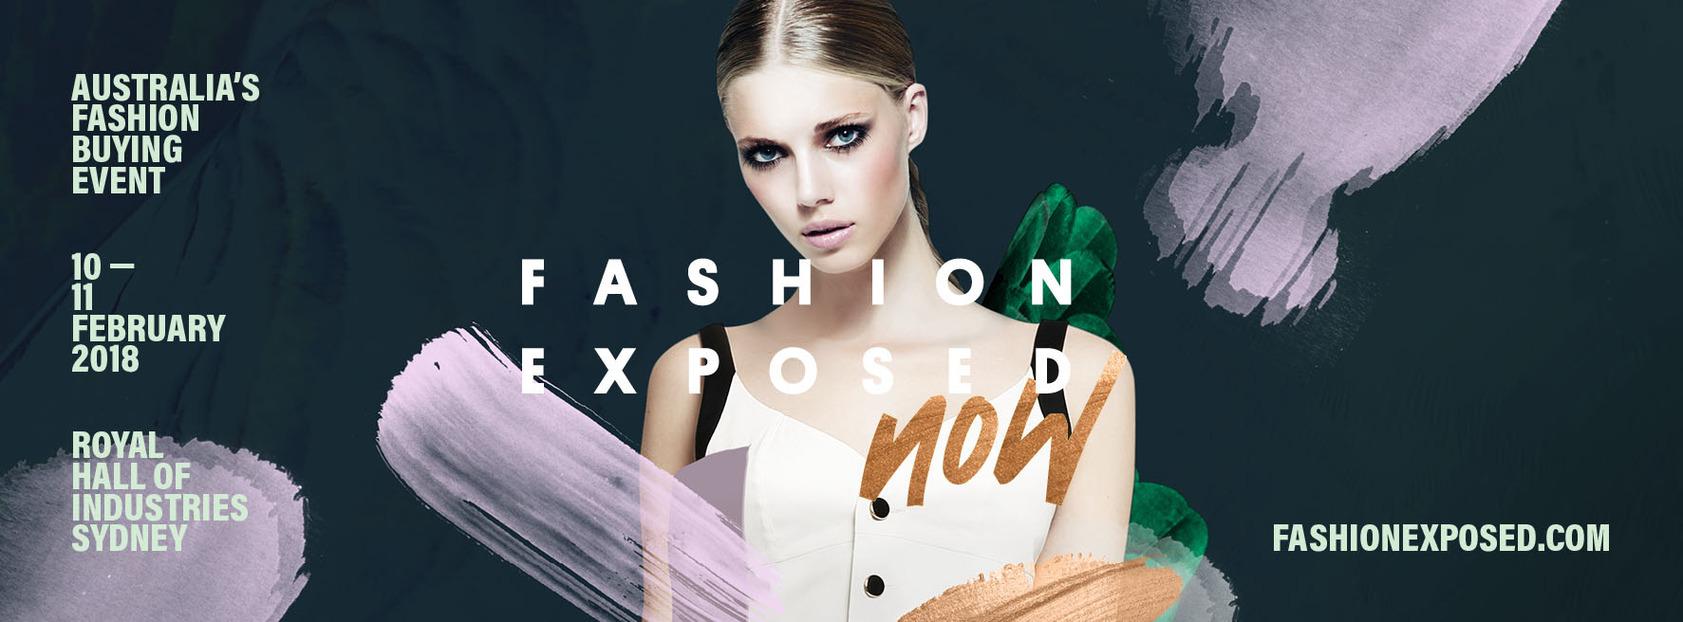 Fashion_Exposed_now_2018_Sydney